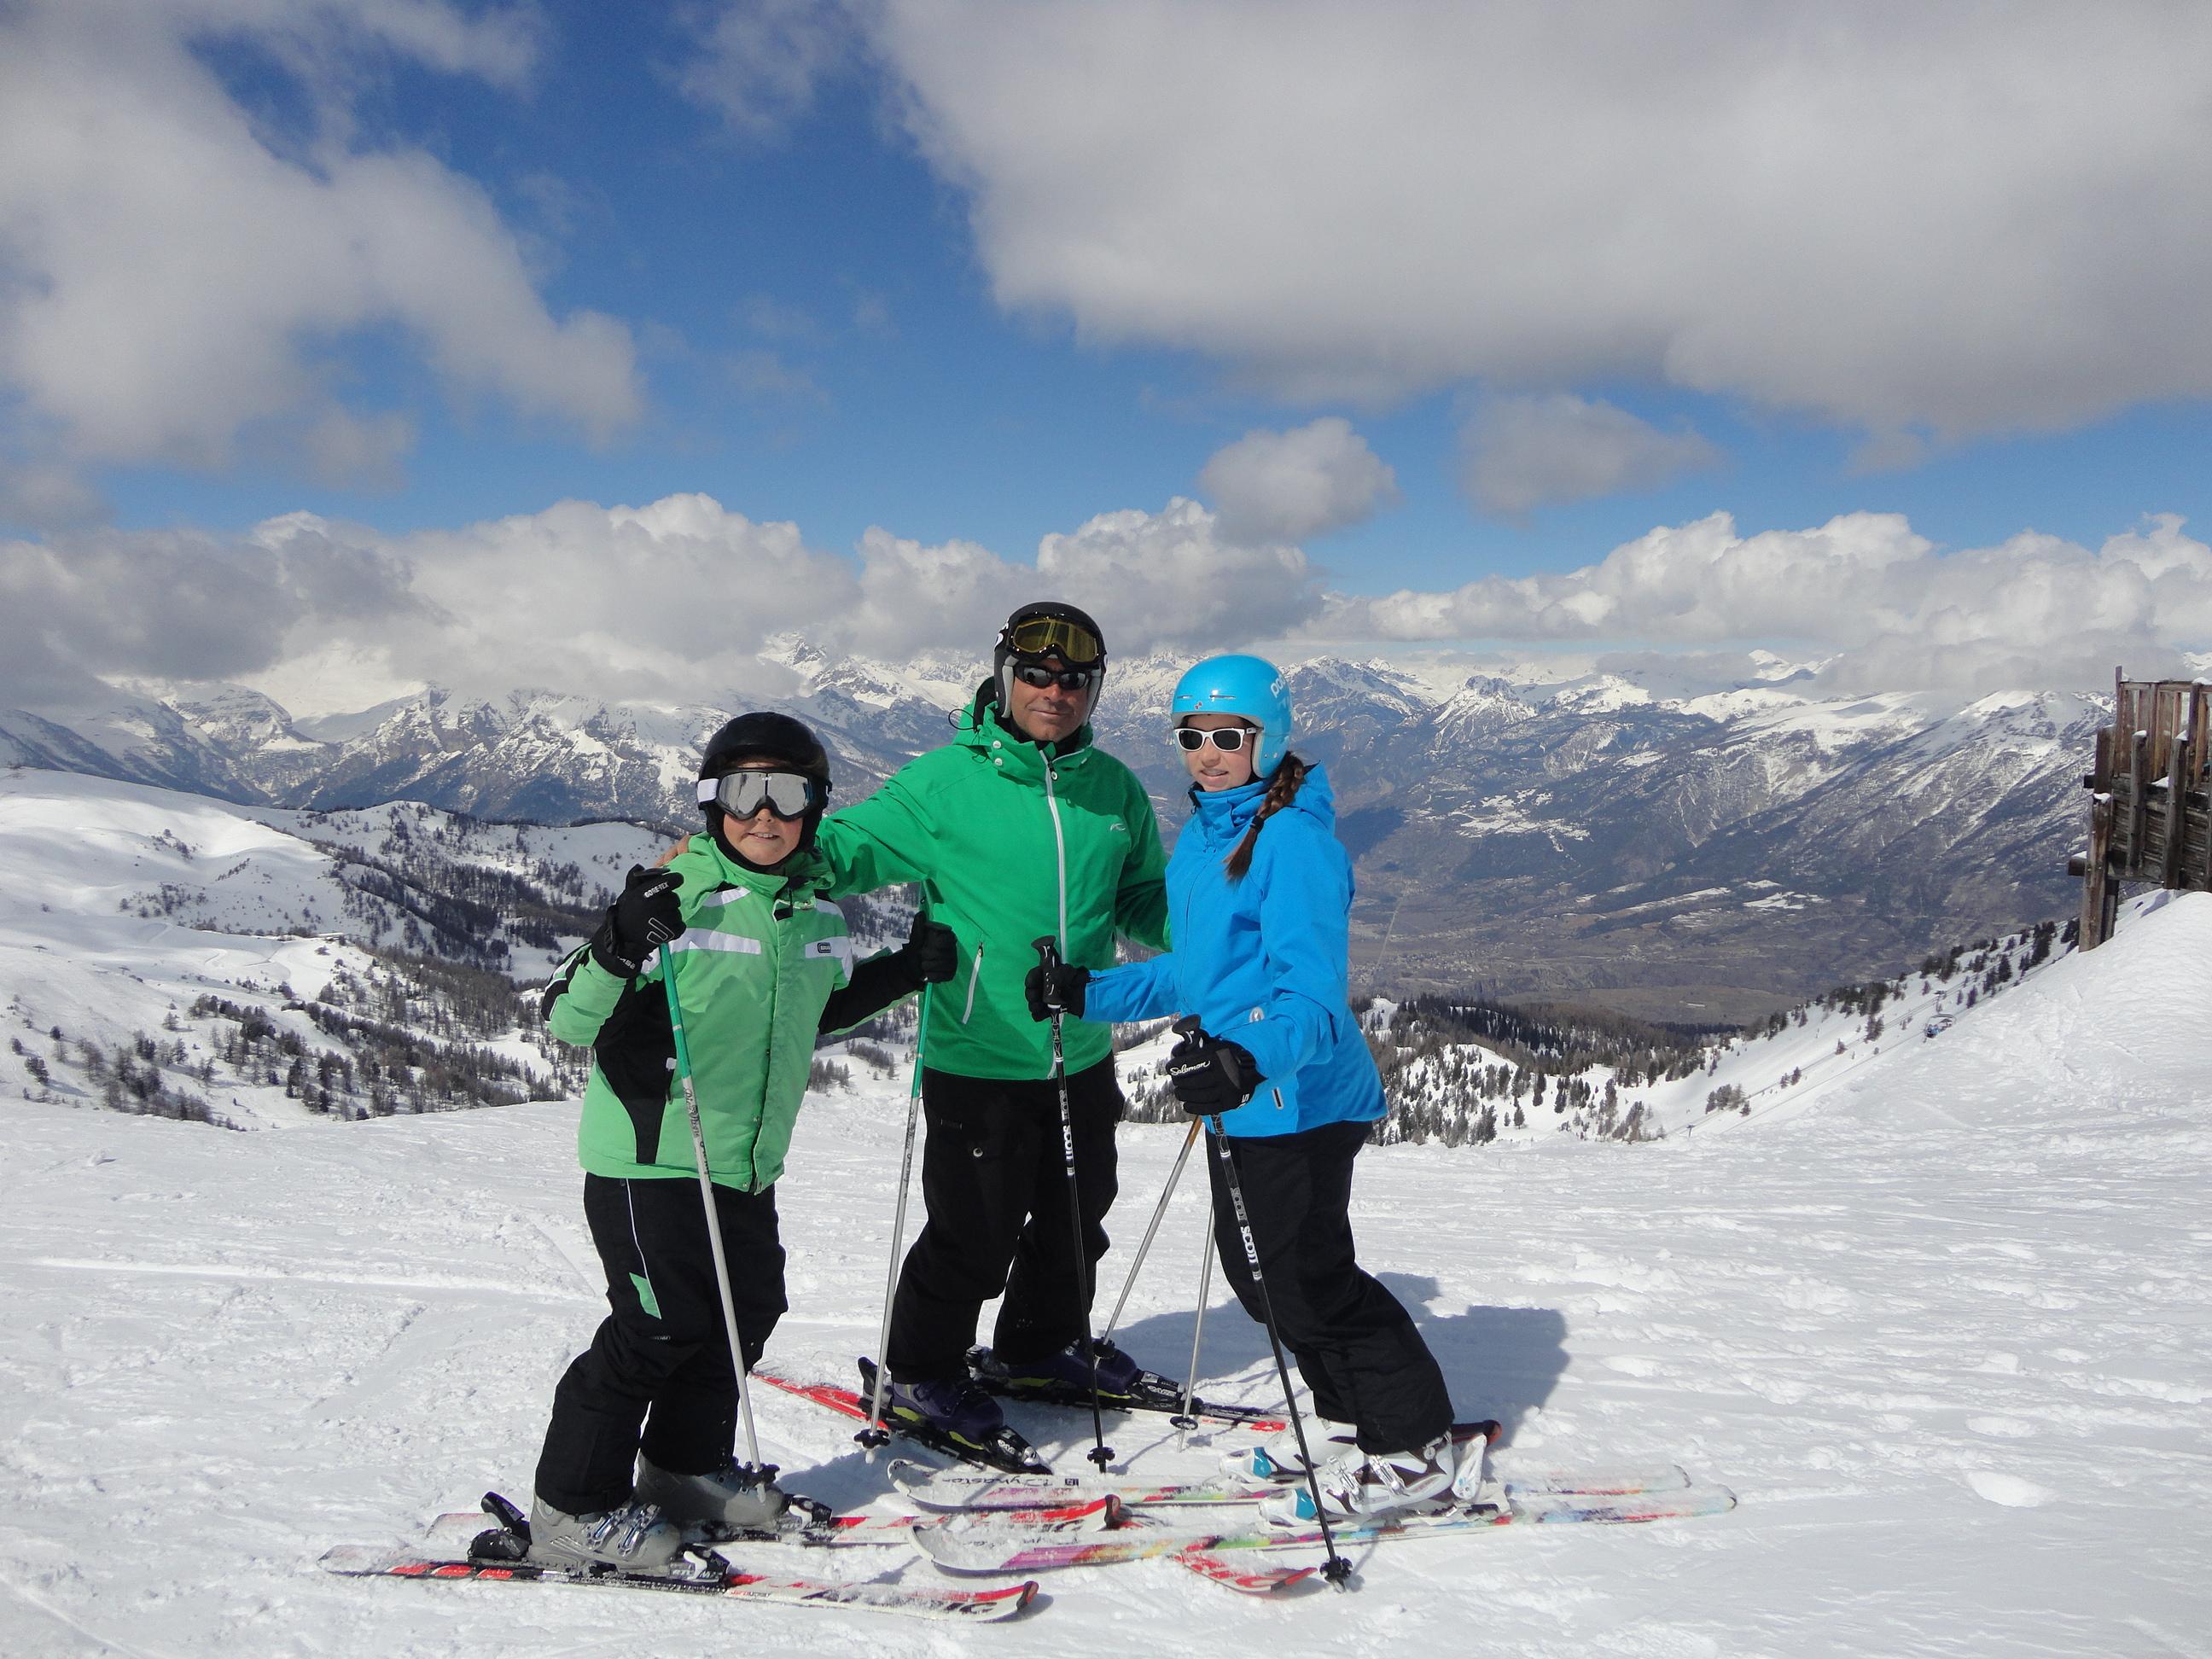 nieve, ski, deporte, navidad